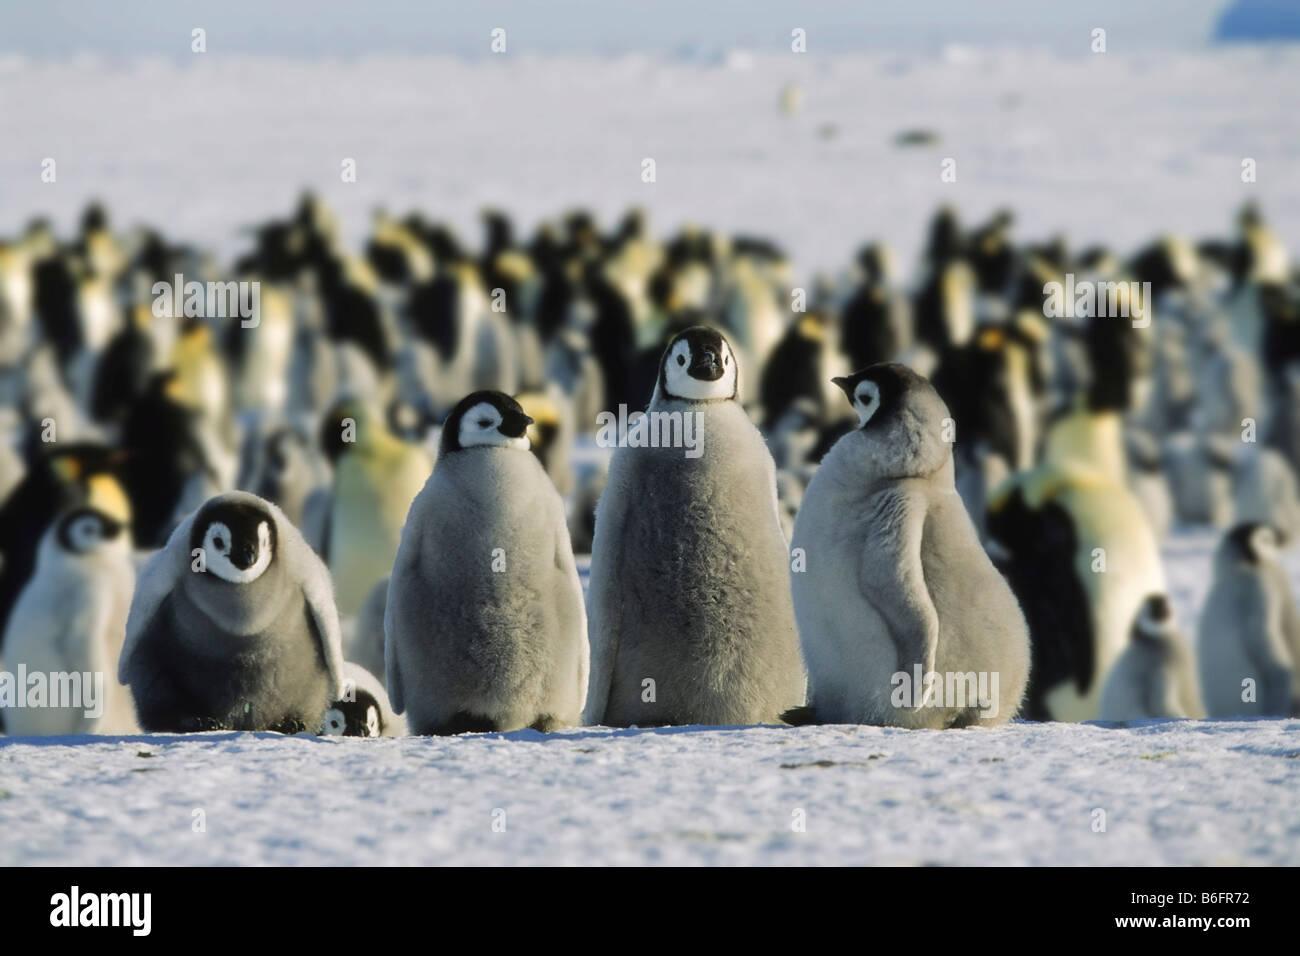 Emperor Penguins (Aptenodytes forsteri), chicks, Antarctica - Stock Image